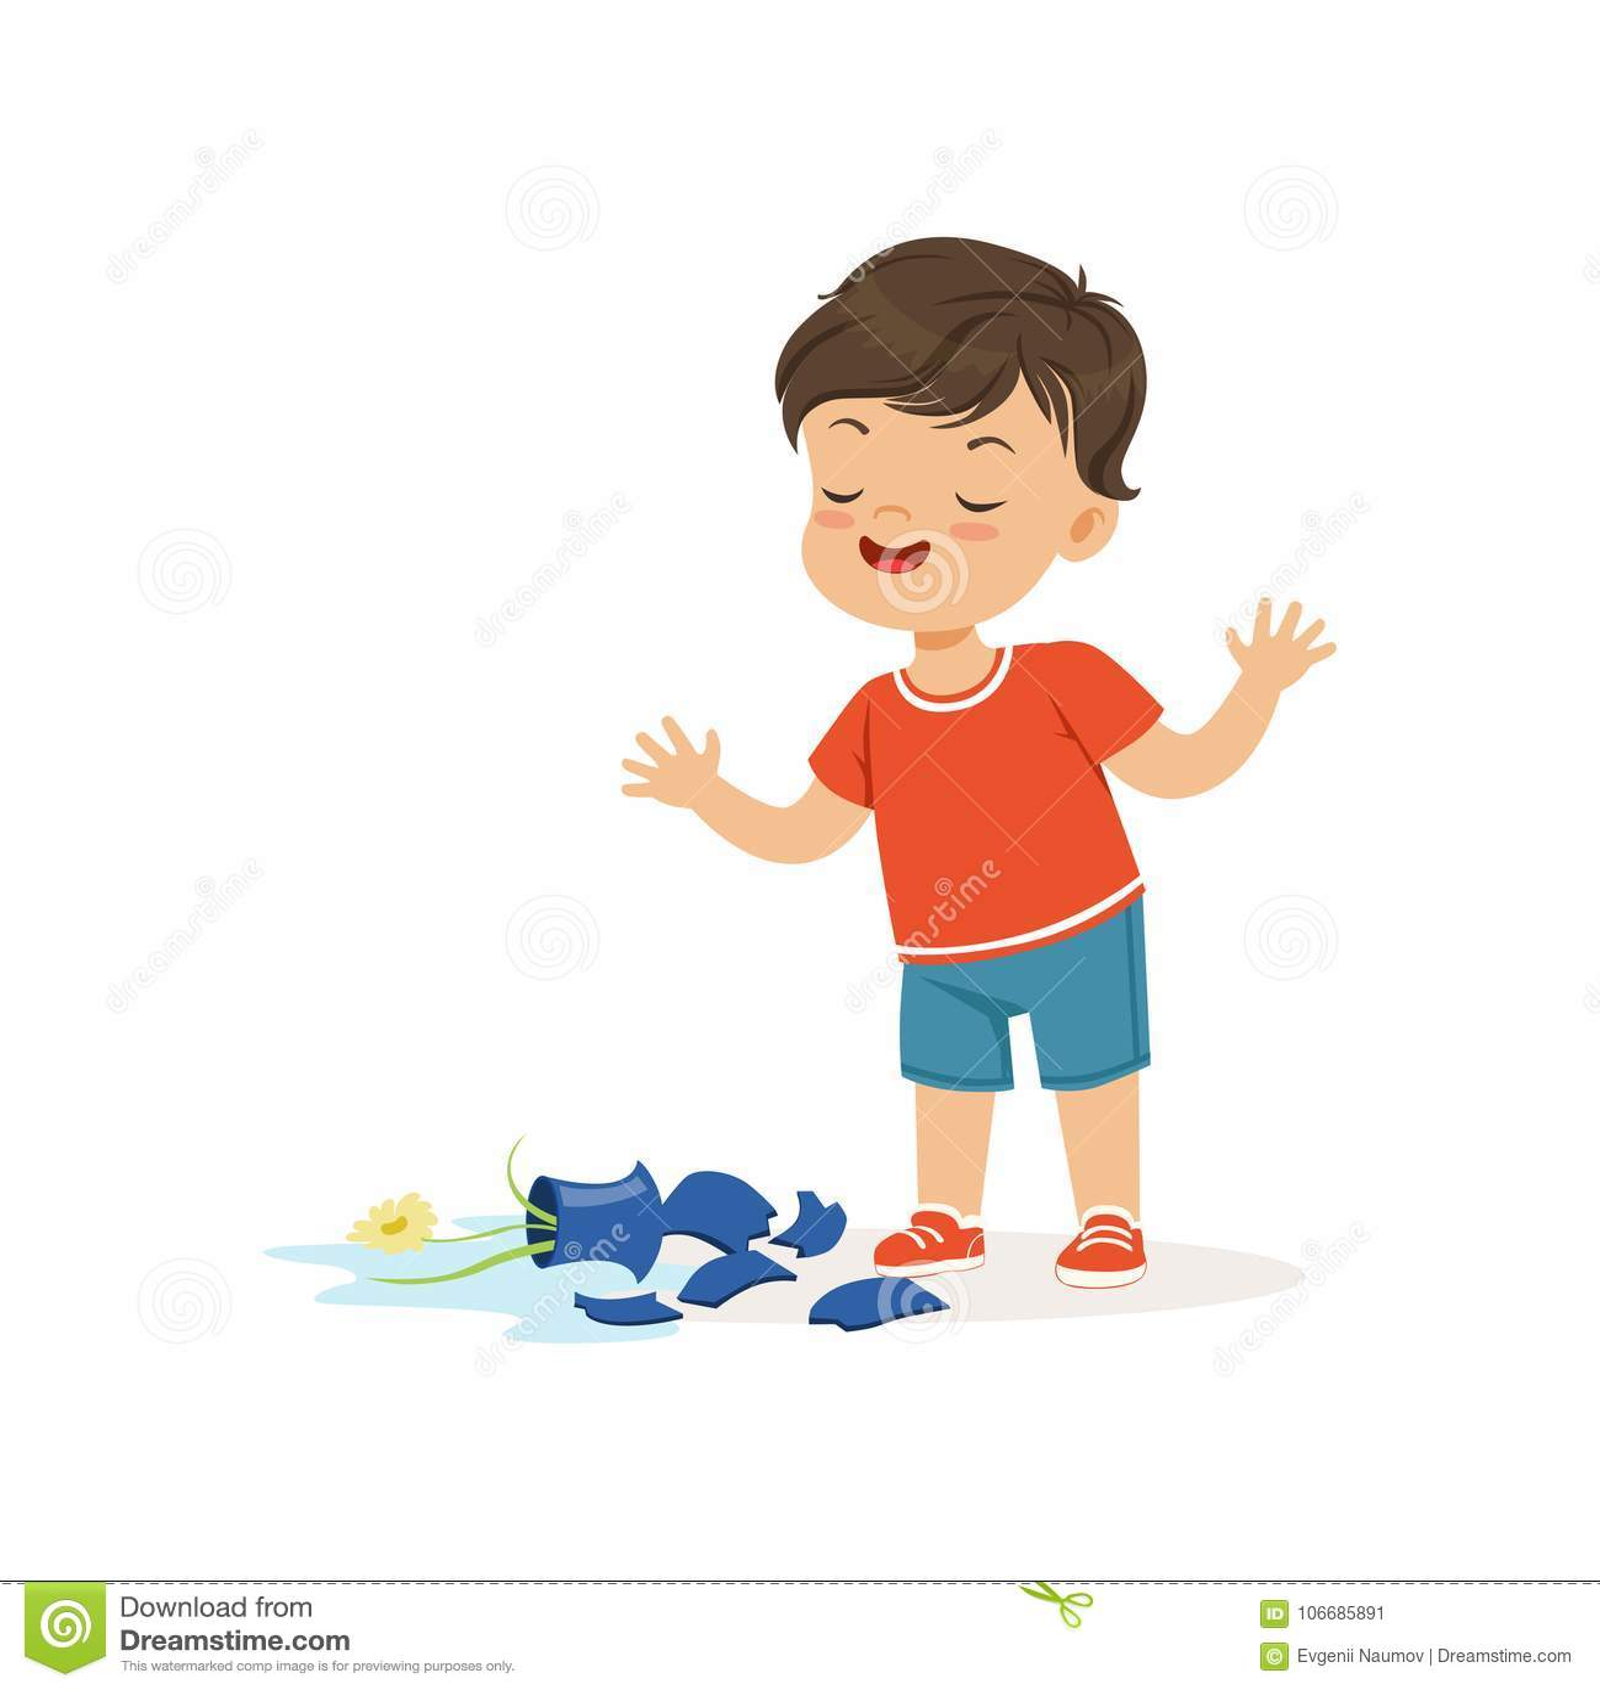 Cute bully boy broke the vase, hoodlum cheerful little kid, bad child behavior vector Illustration